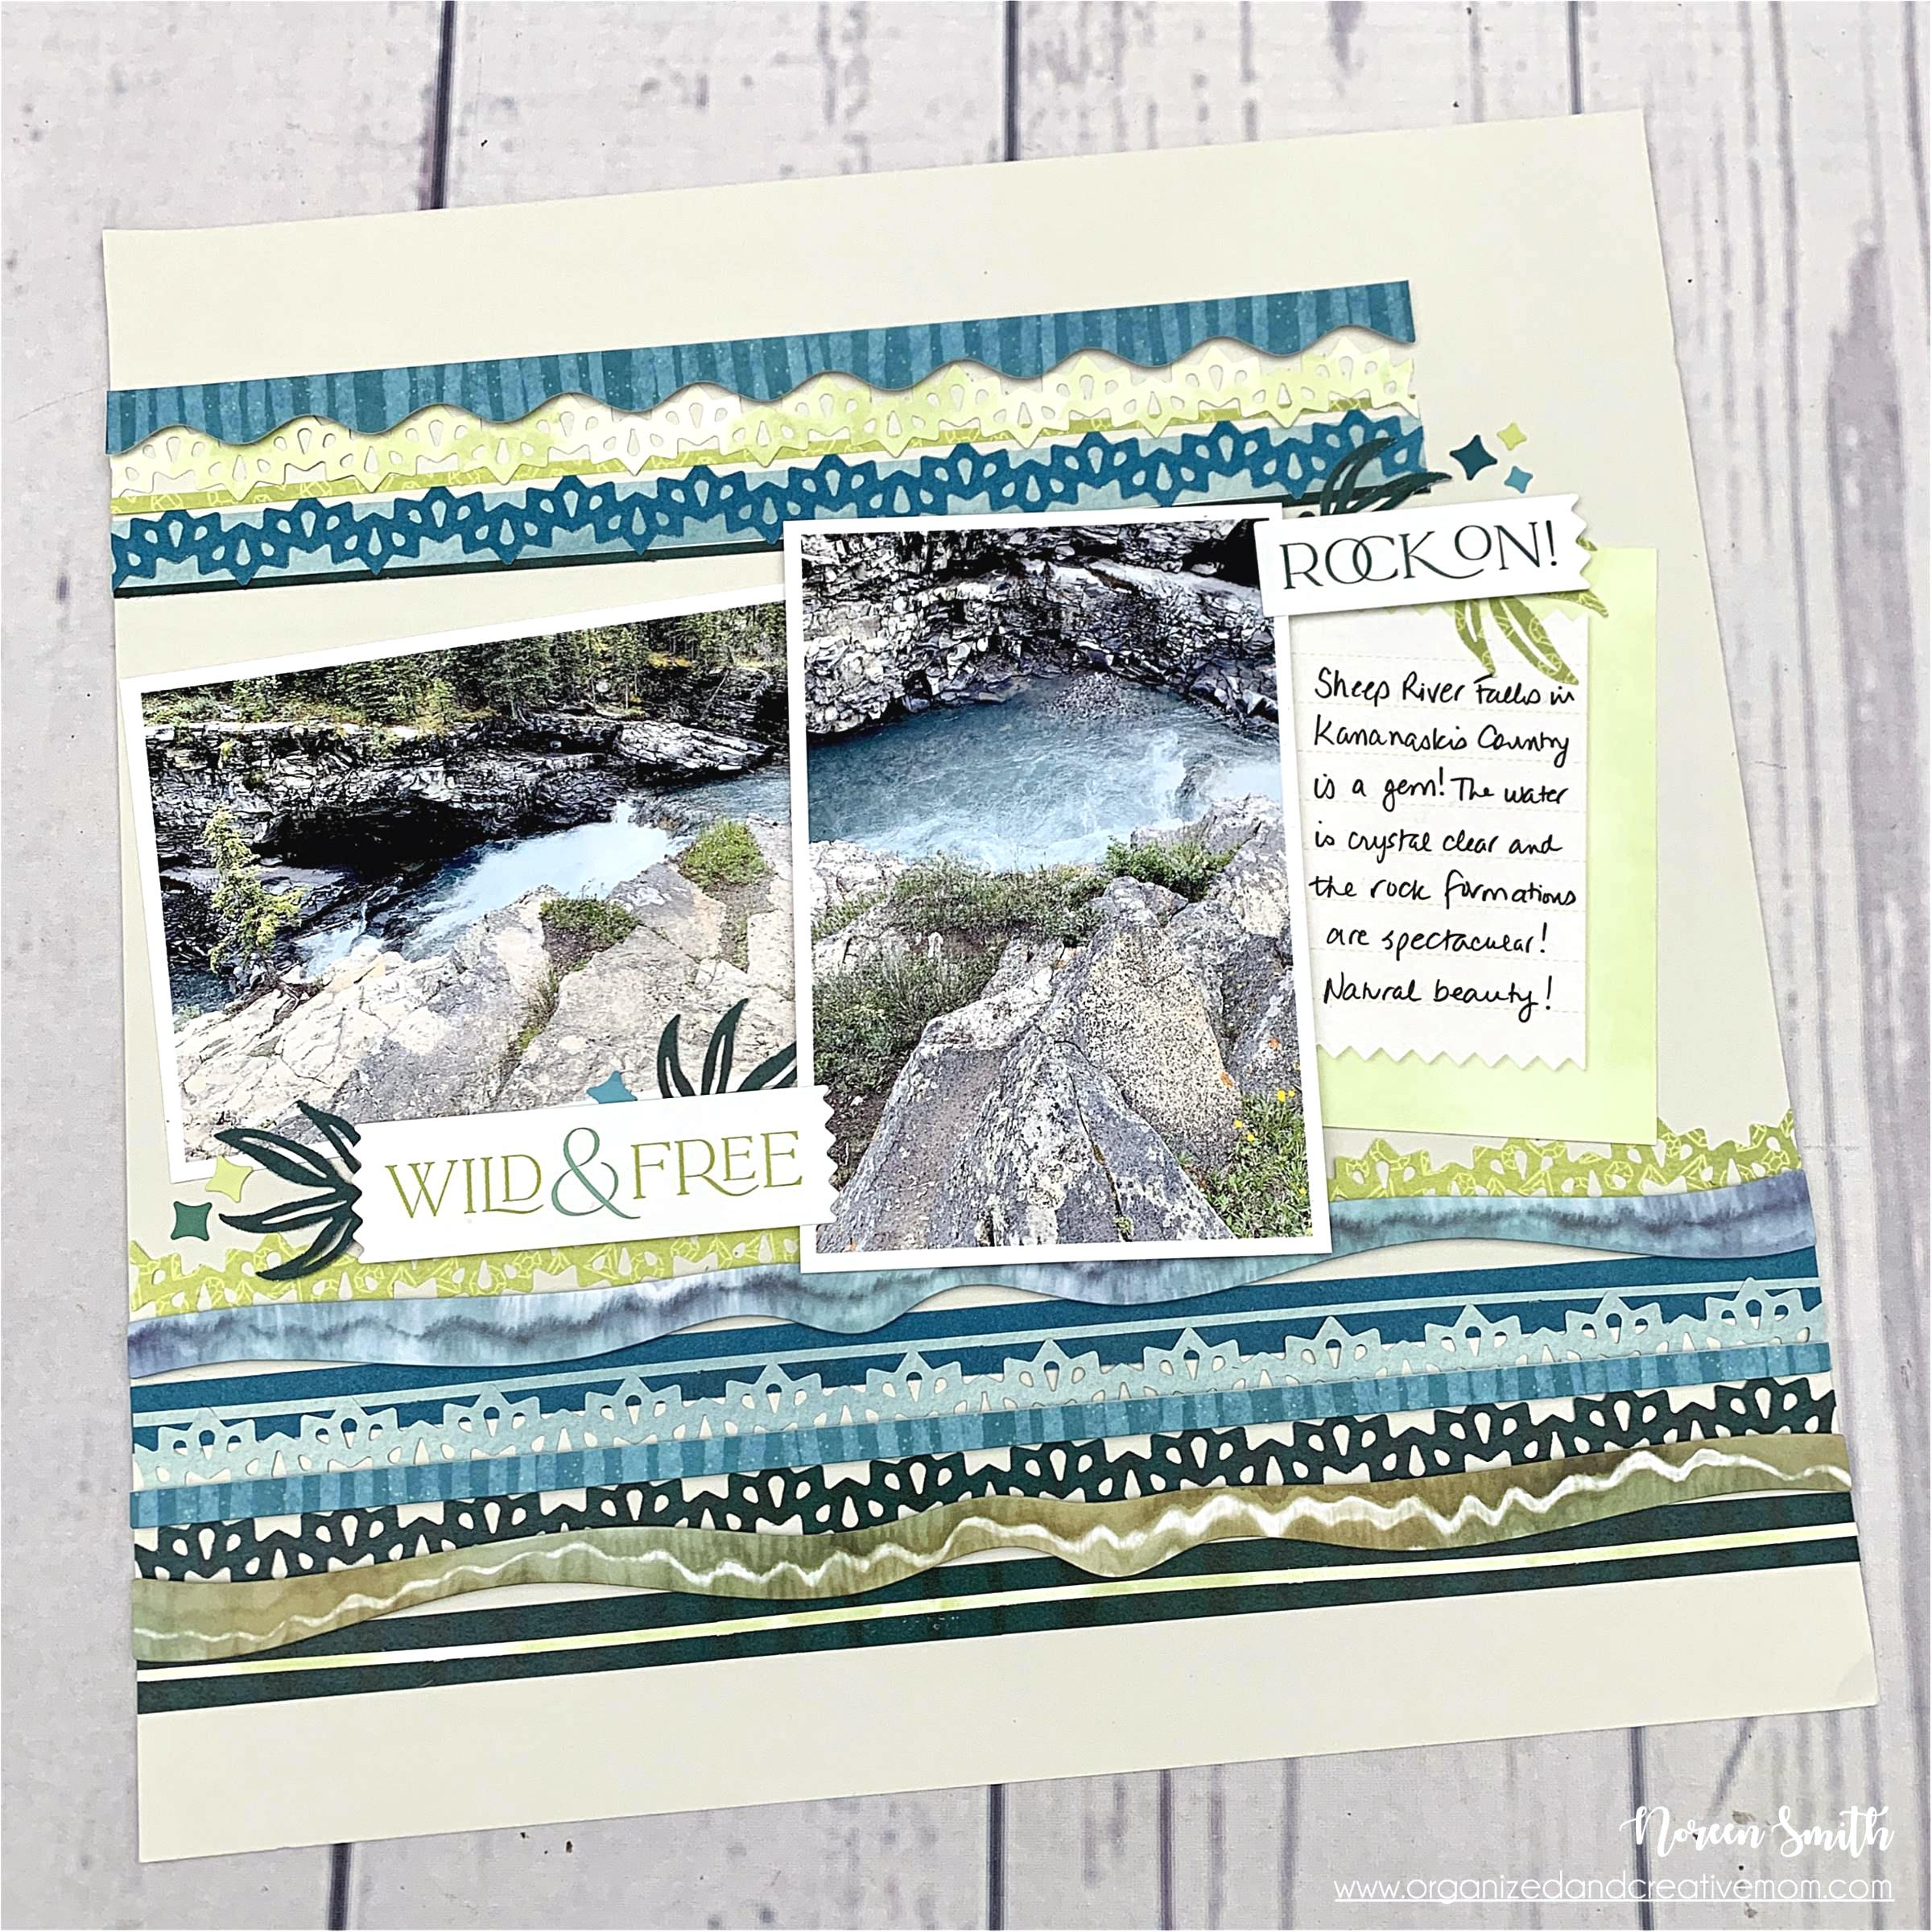 Creative Memories - Emerald Gemstone Collection - Noreen Smith